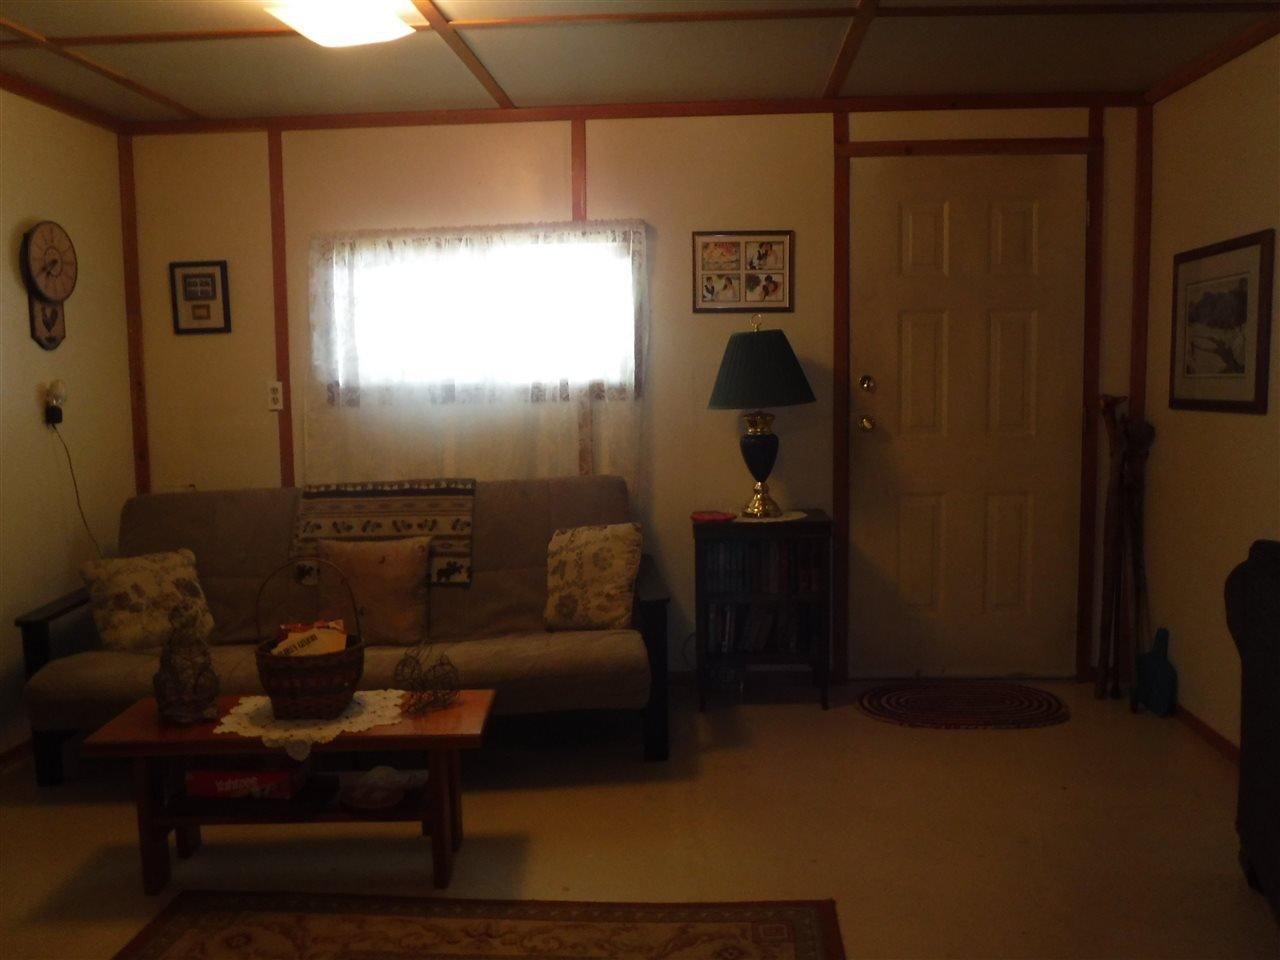 Photo 31: Photos: 3126 ELSEY Road in Williams Lake: Williams Lake - Rural West House for sale (Williams Lake (Zone 27))  : MLS®# R2467730